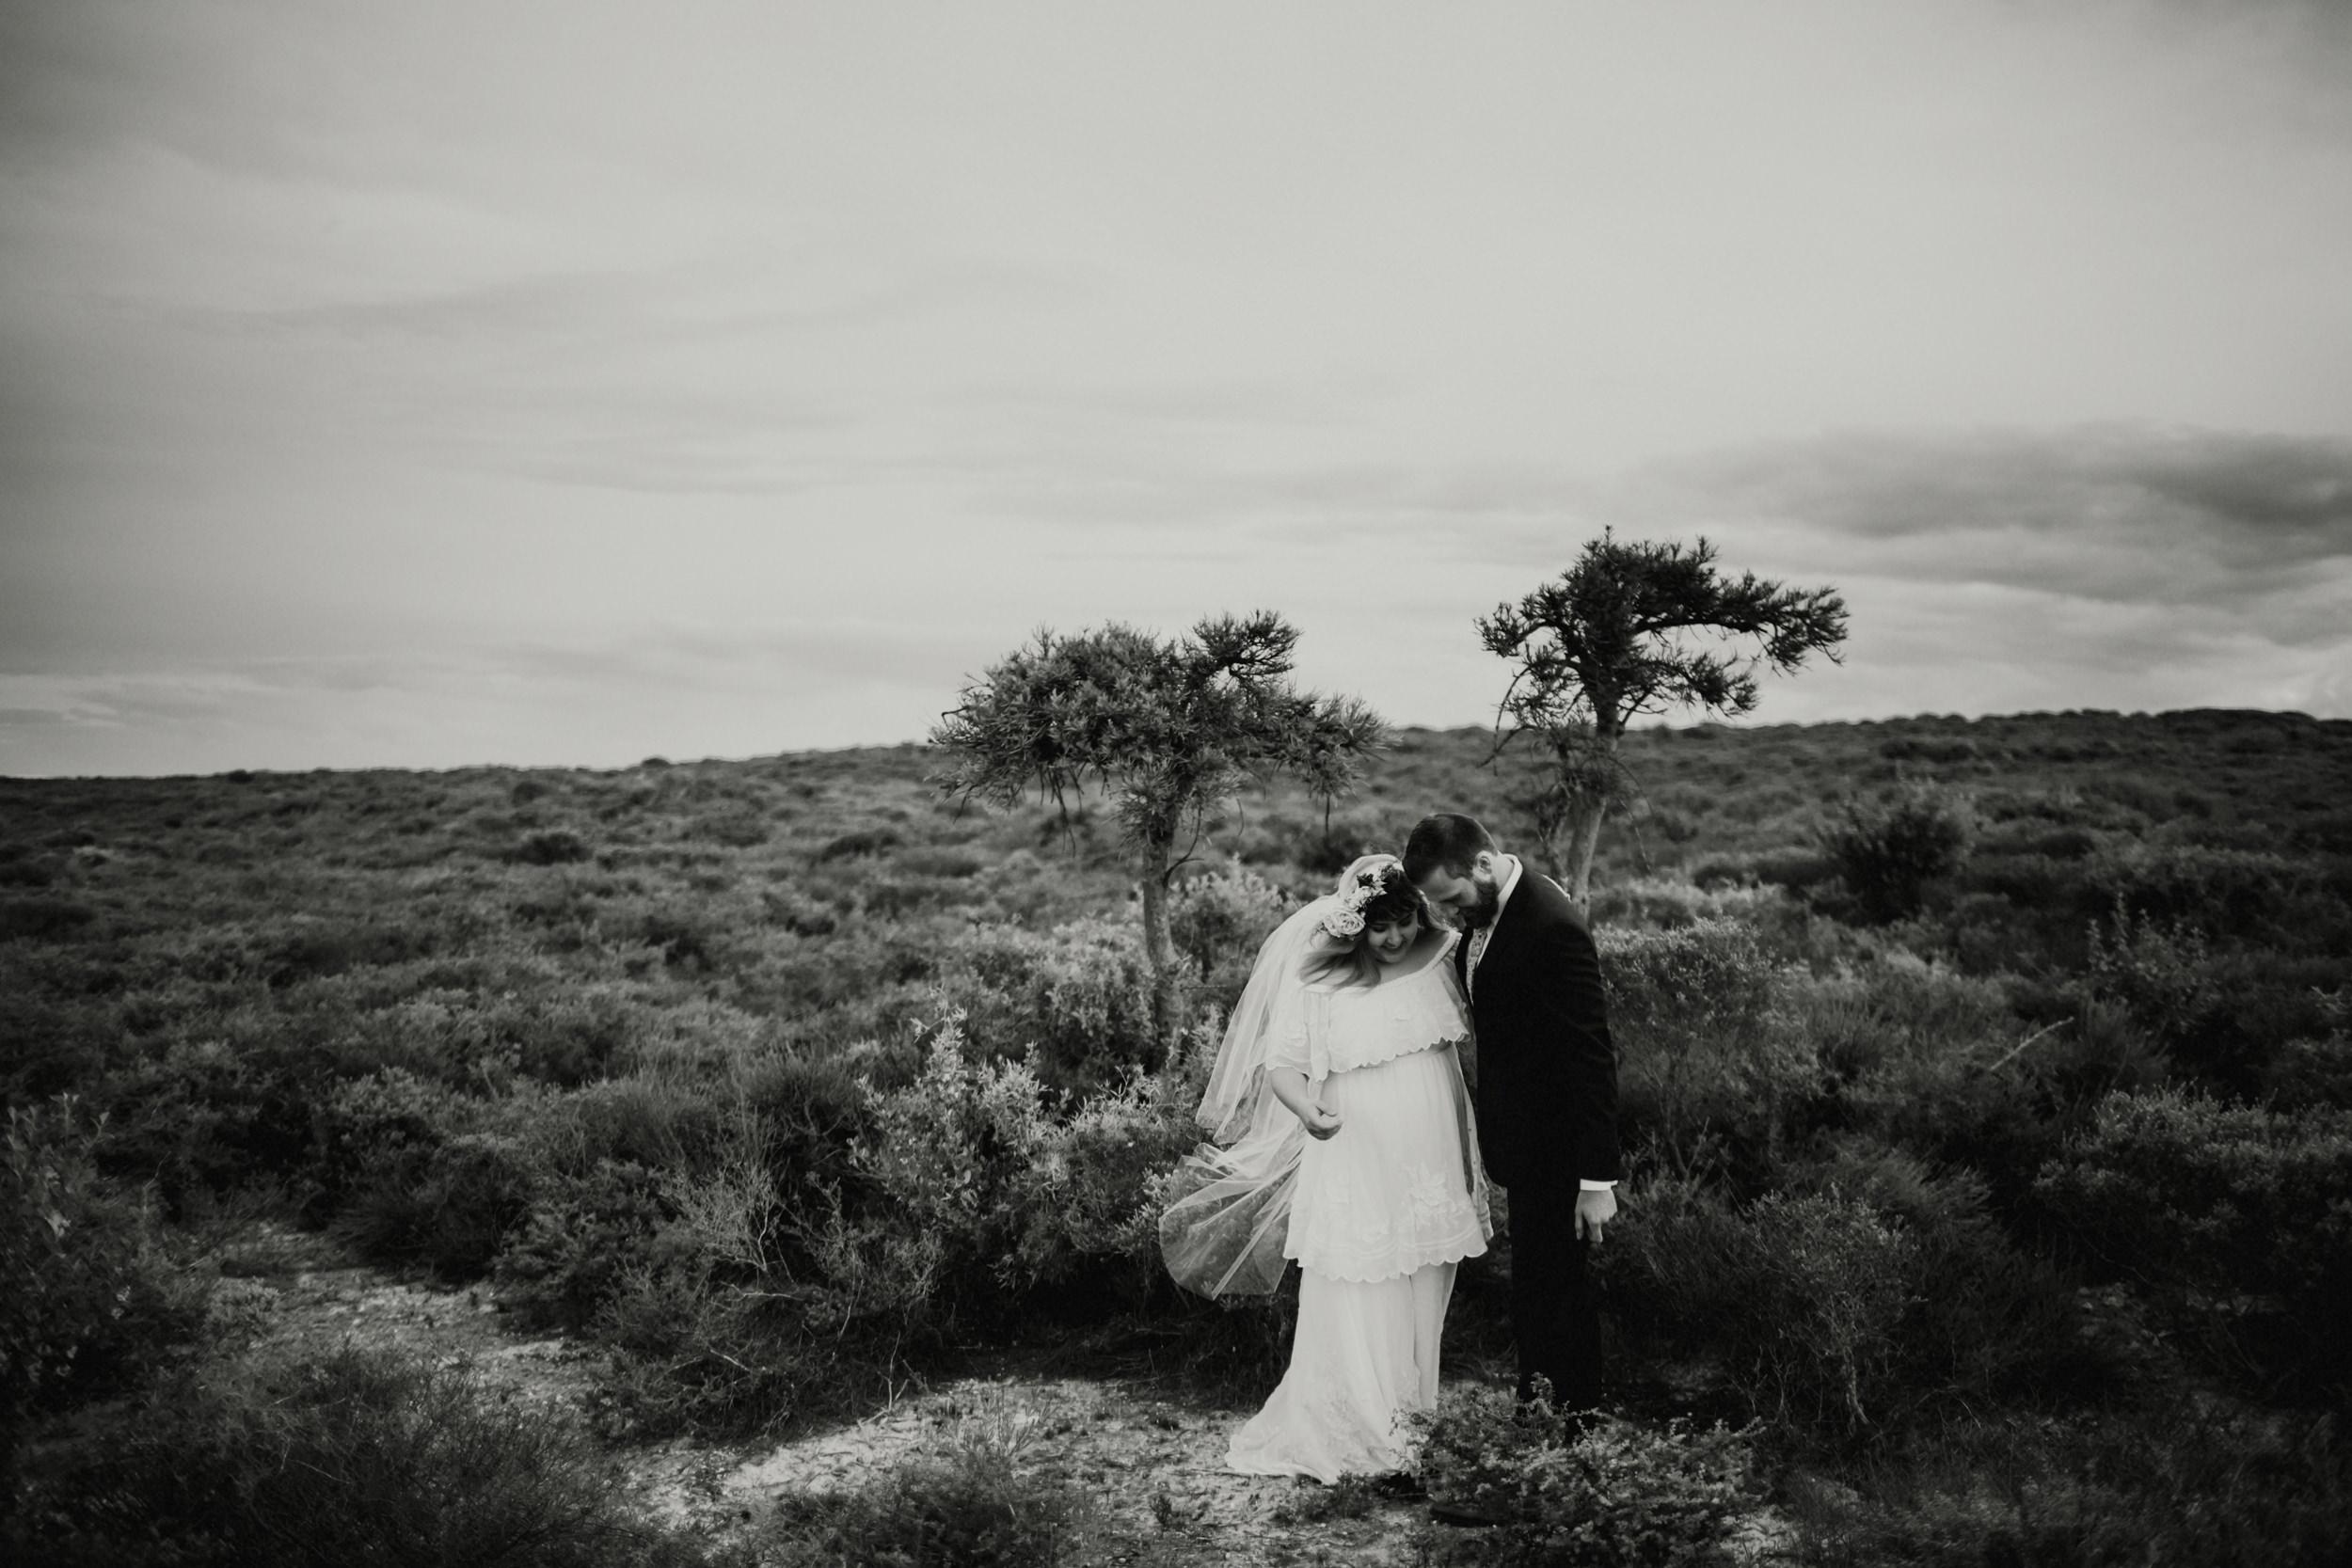 I-Got-You-Babe-Weddings-Hannah-Brent-Anniversary0023.JPG